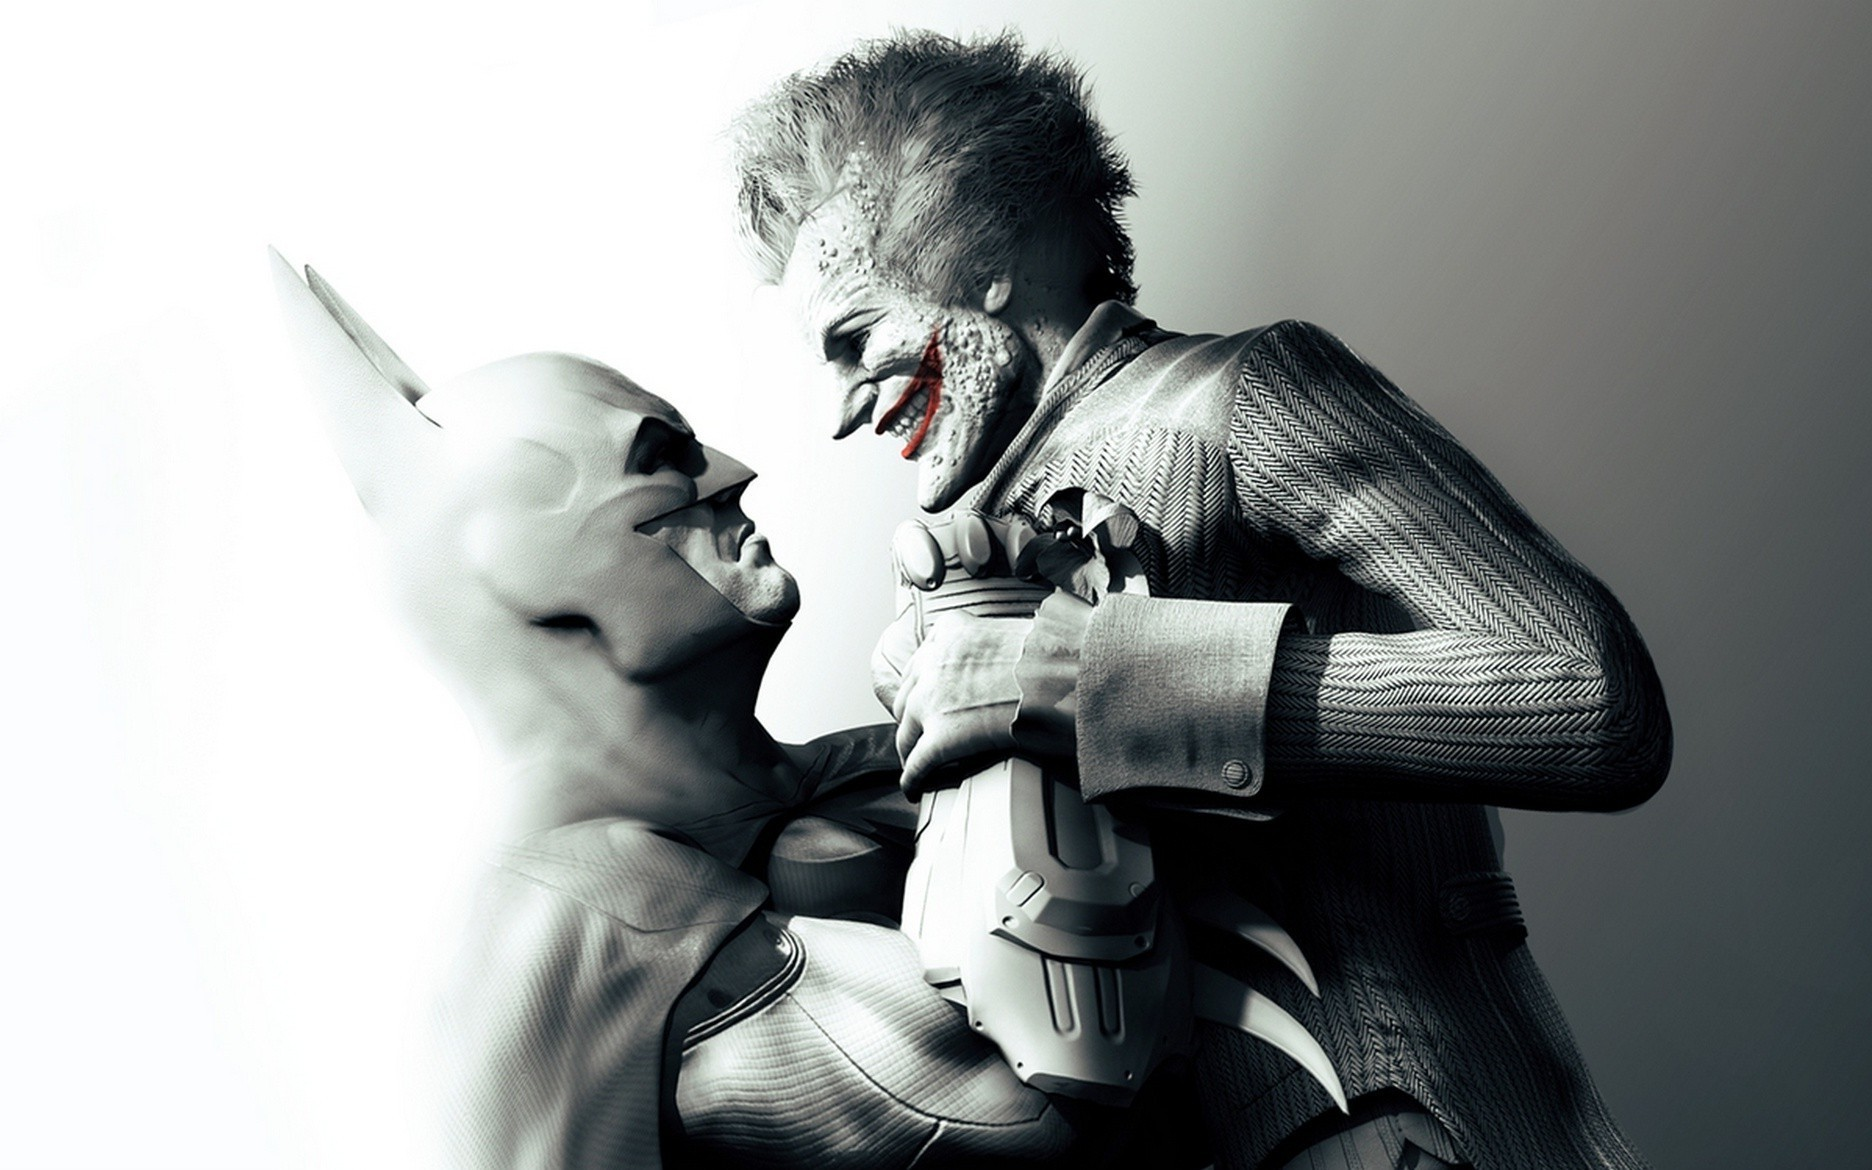 Batman, Joker Wallpapers HD / Desktop and Mobile Backgrounds